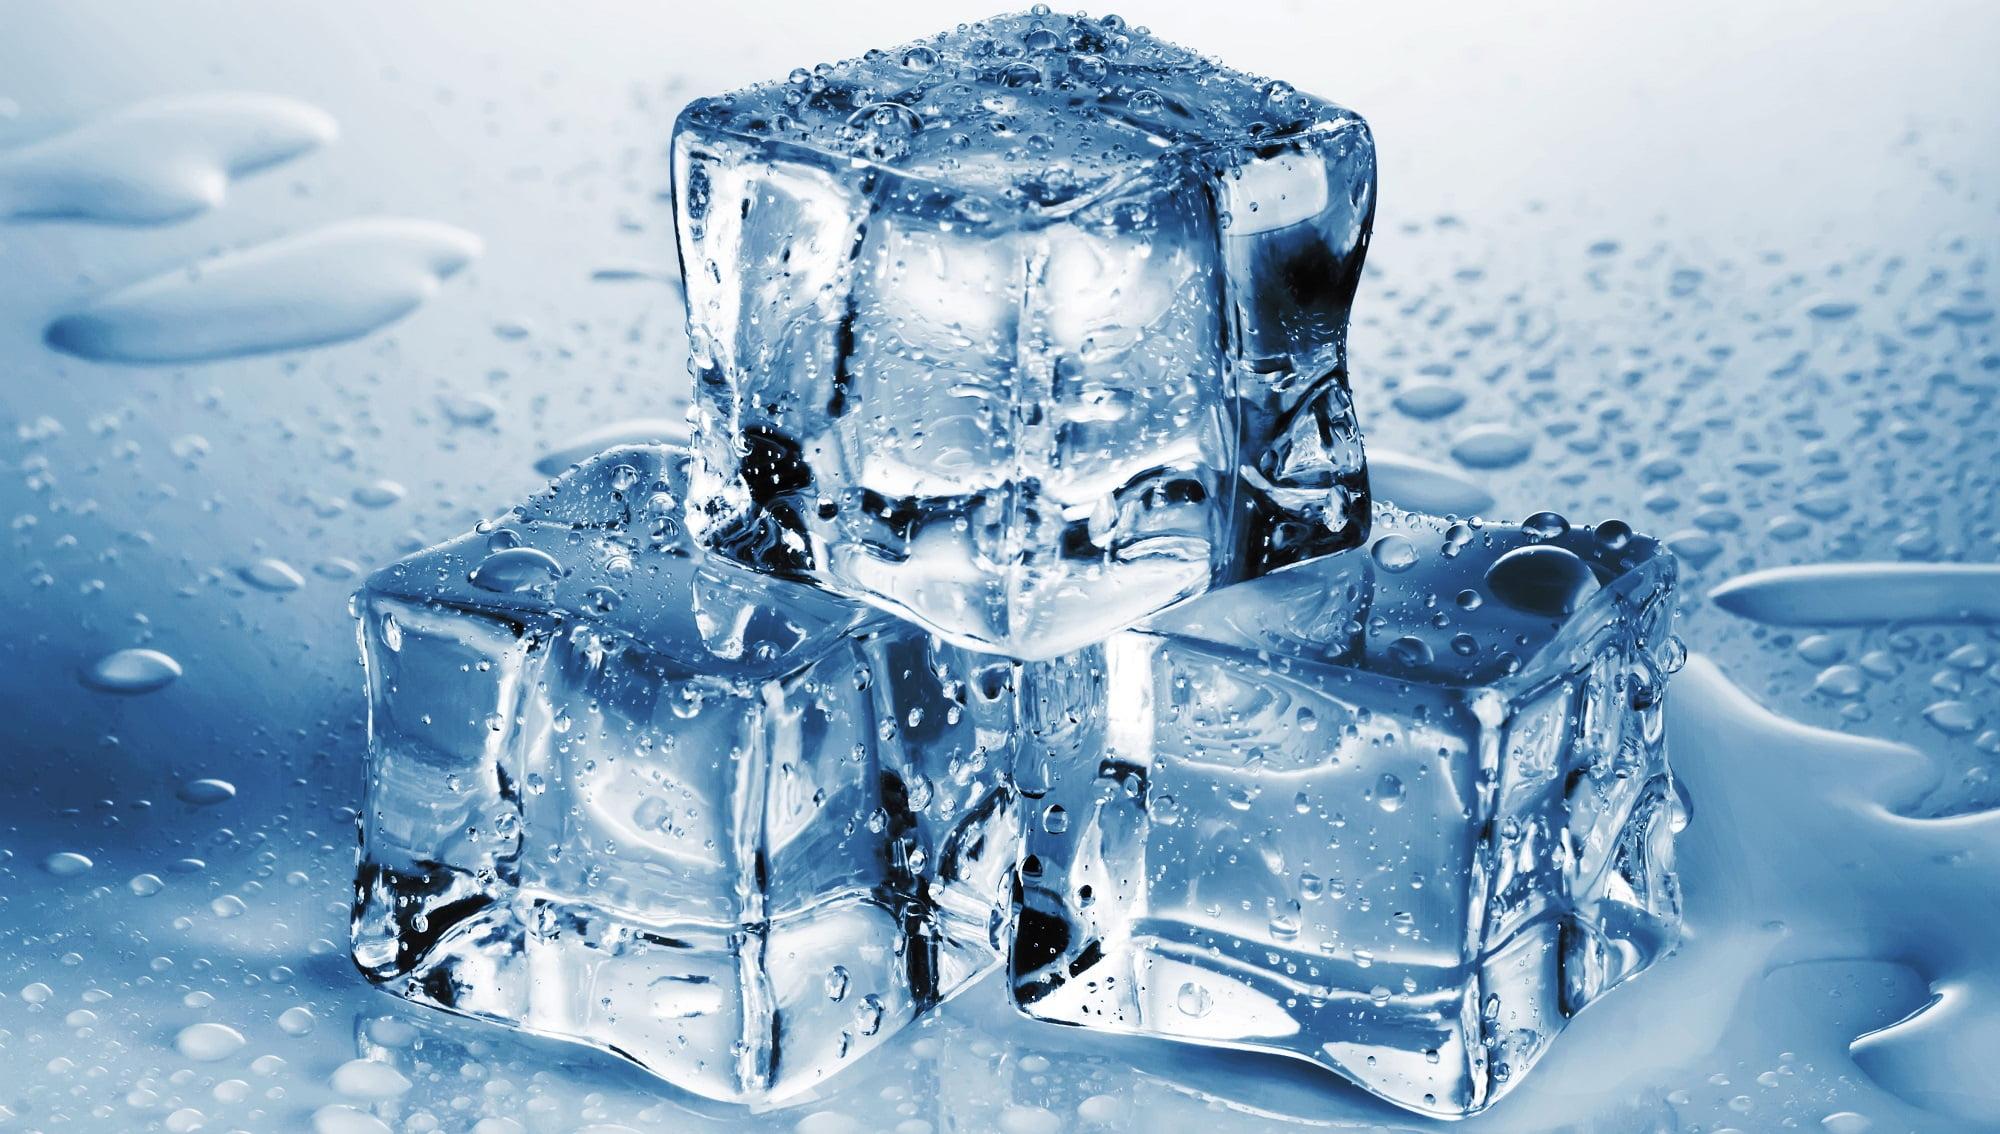 Credo Develops Ice-Capade An Ice Adventure